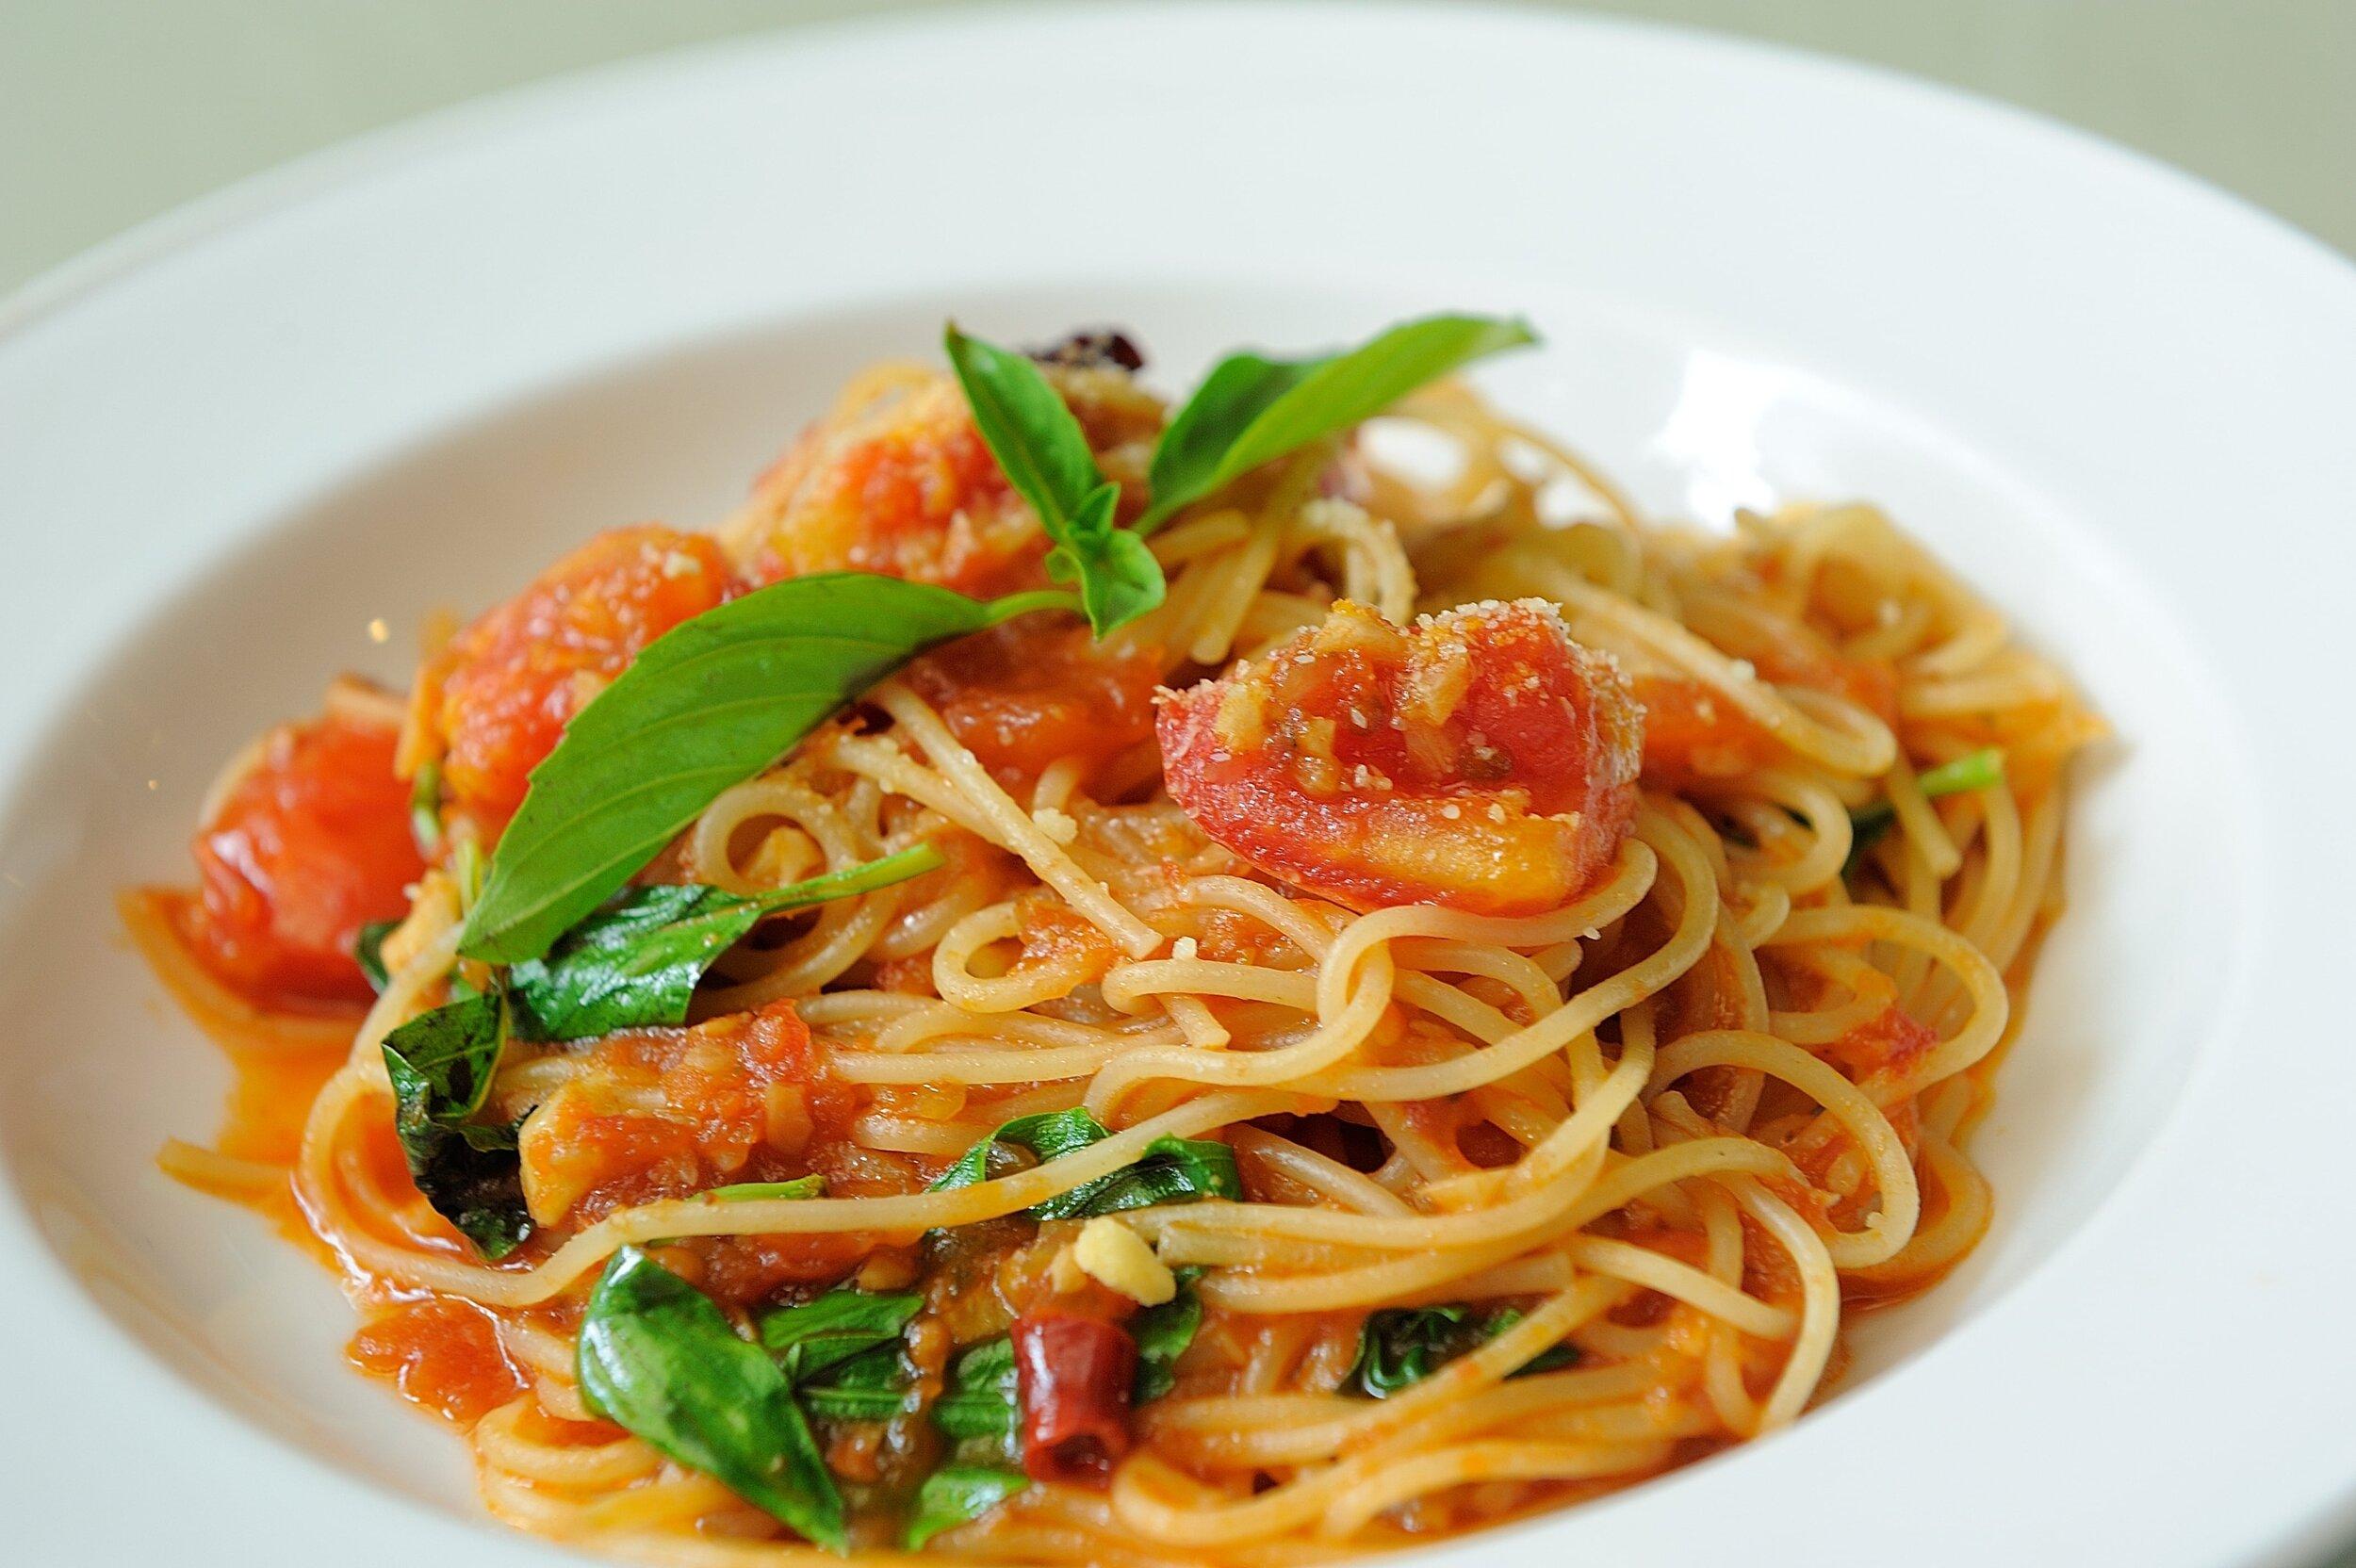 The Italian vegan pasta, Pasta al Pomodoro e Basilico